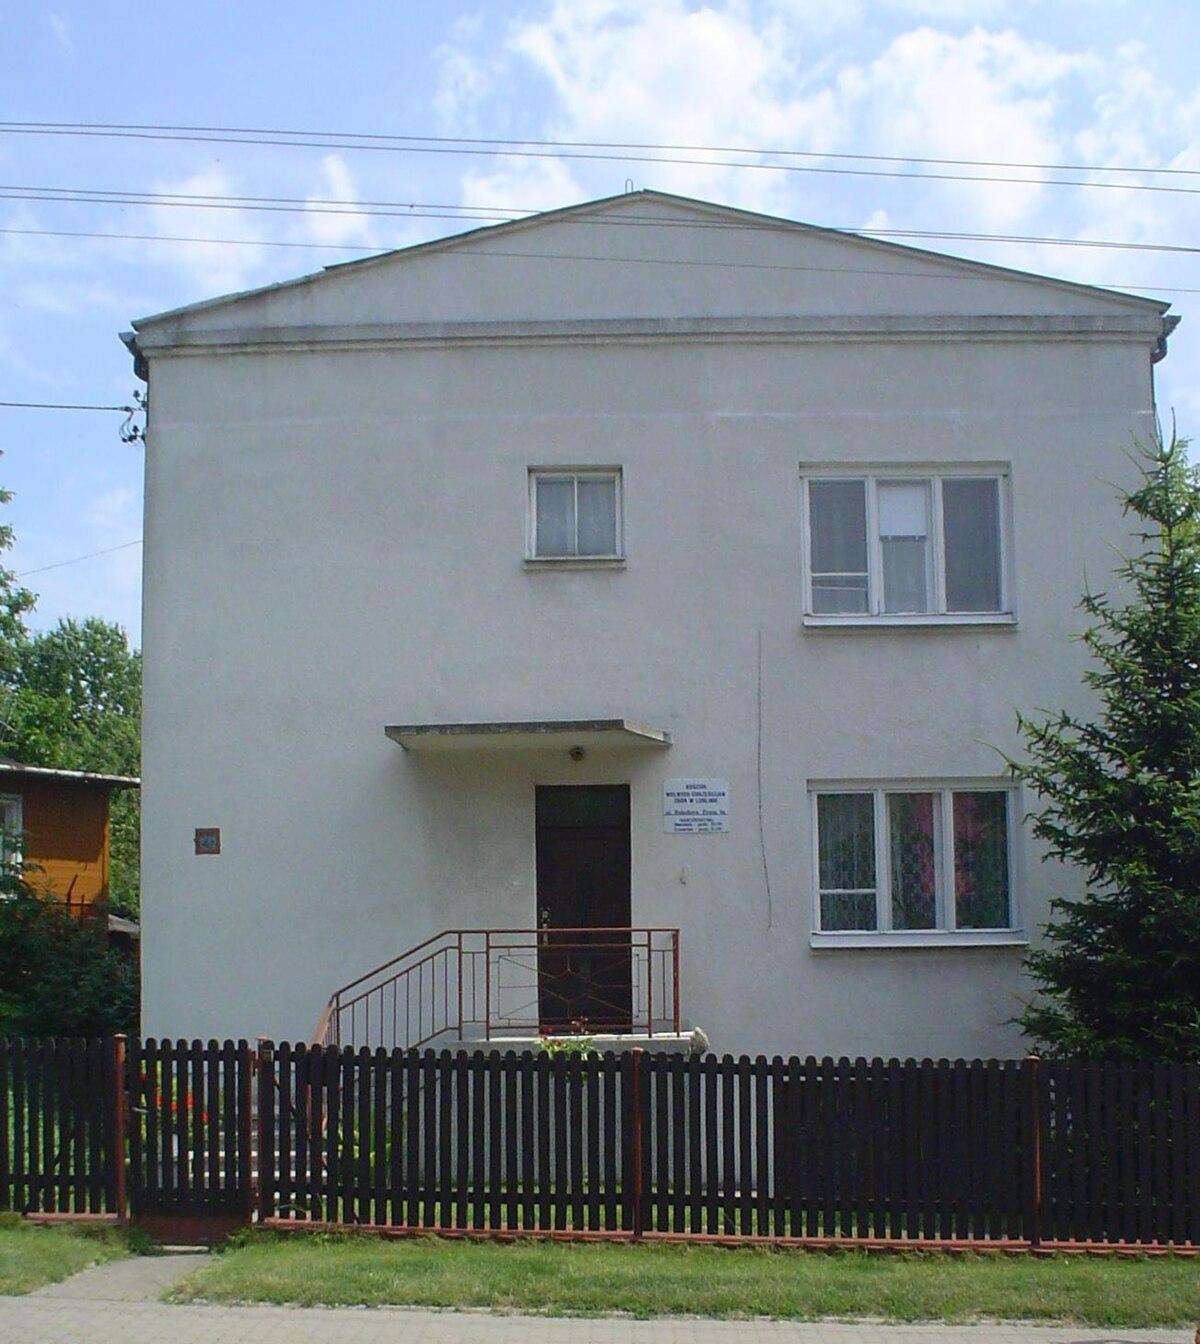 senior randki org Lublin